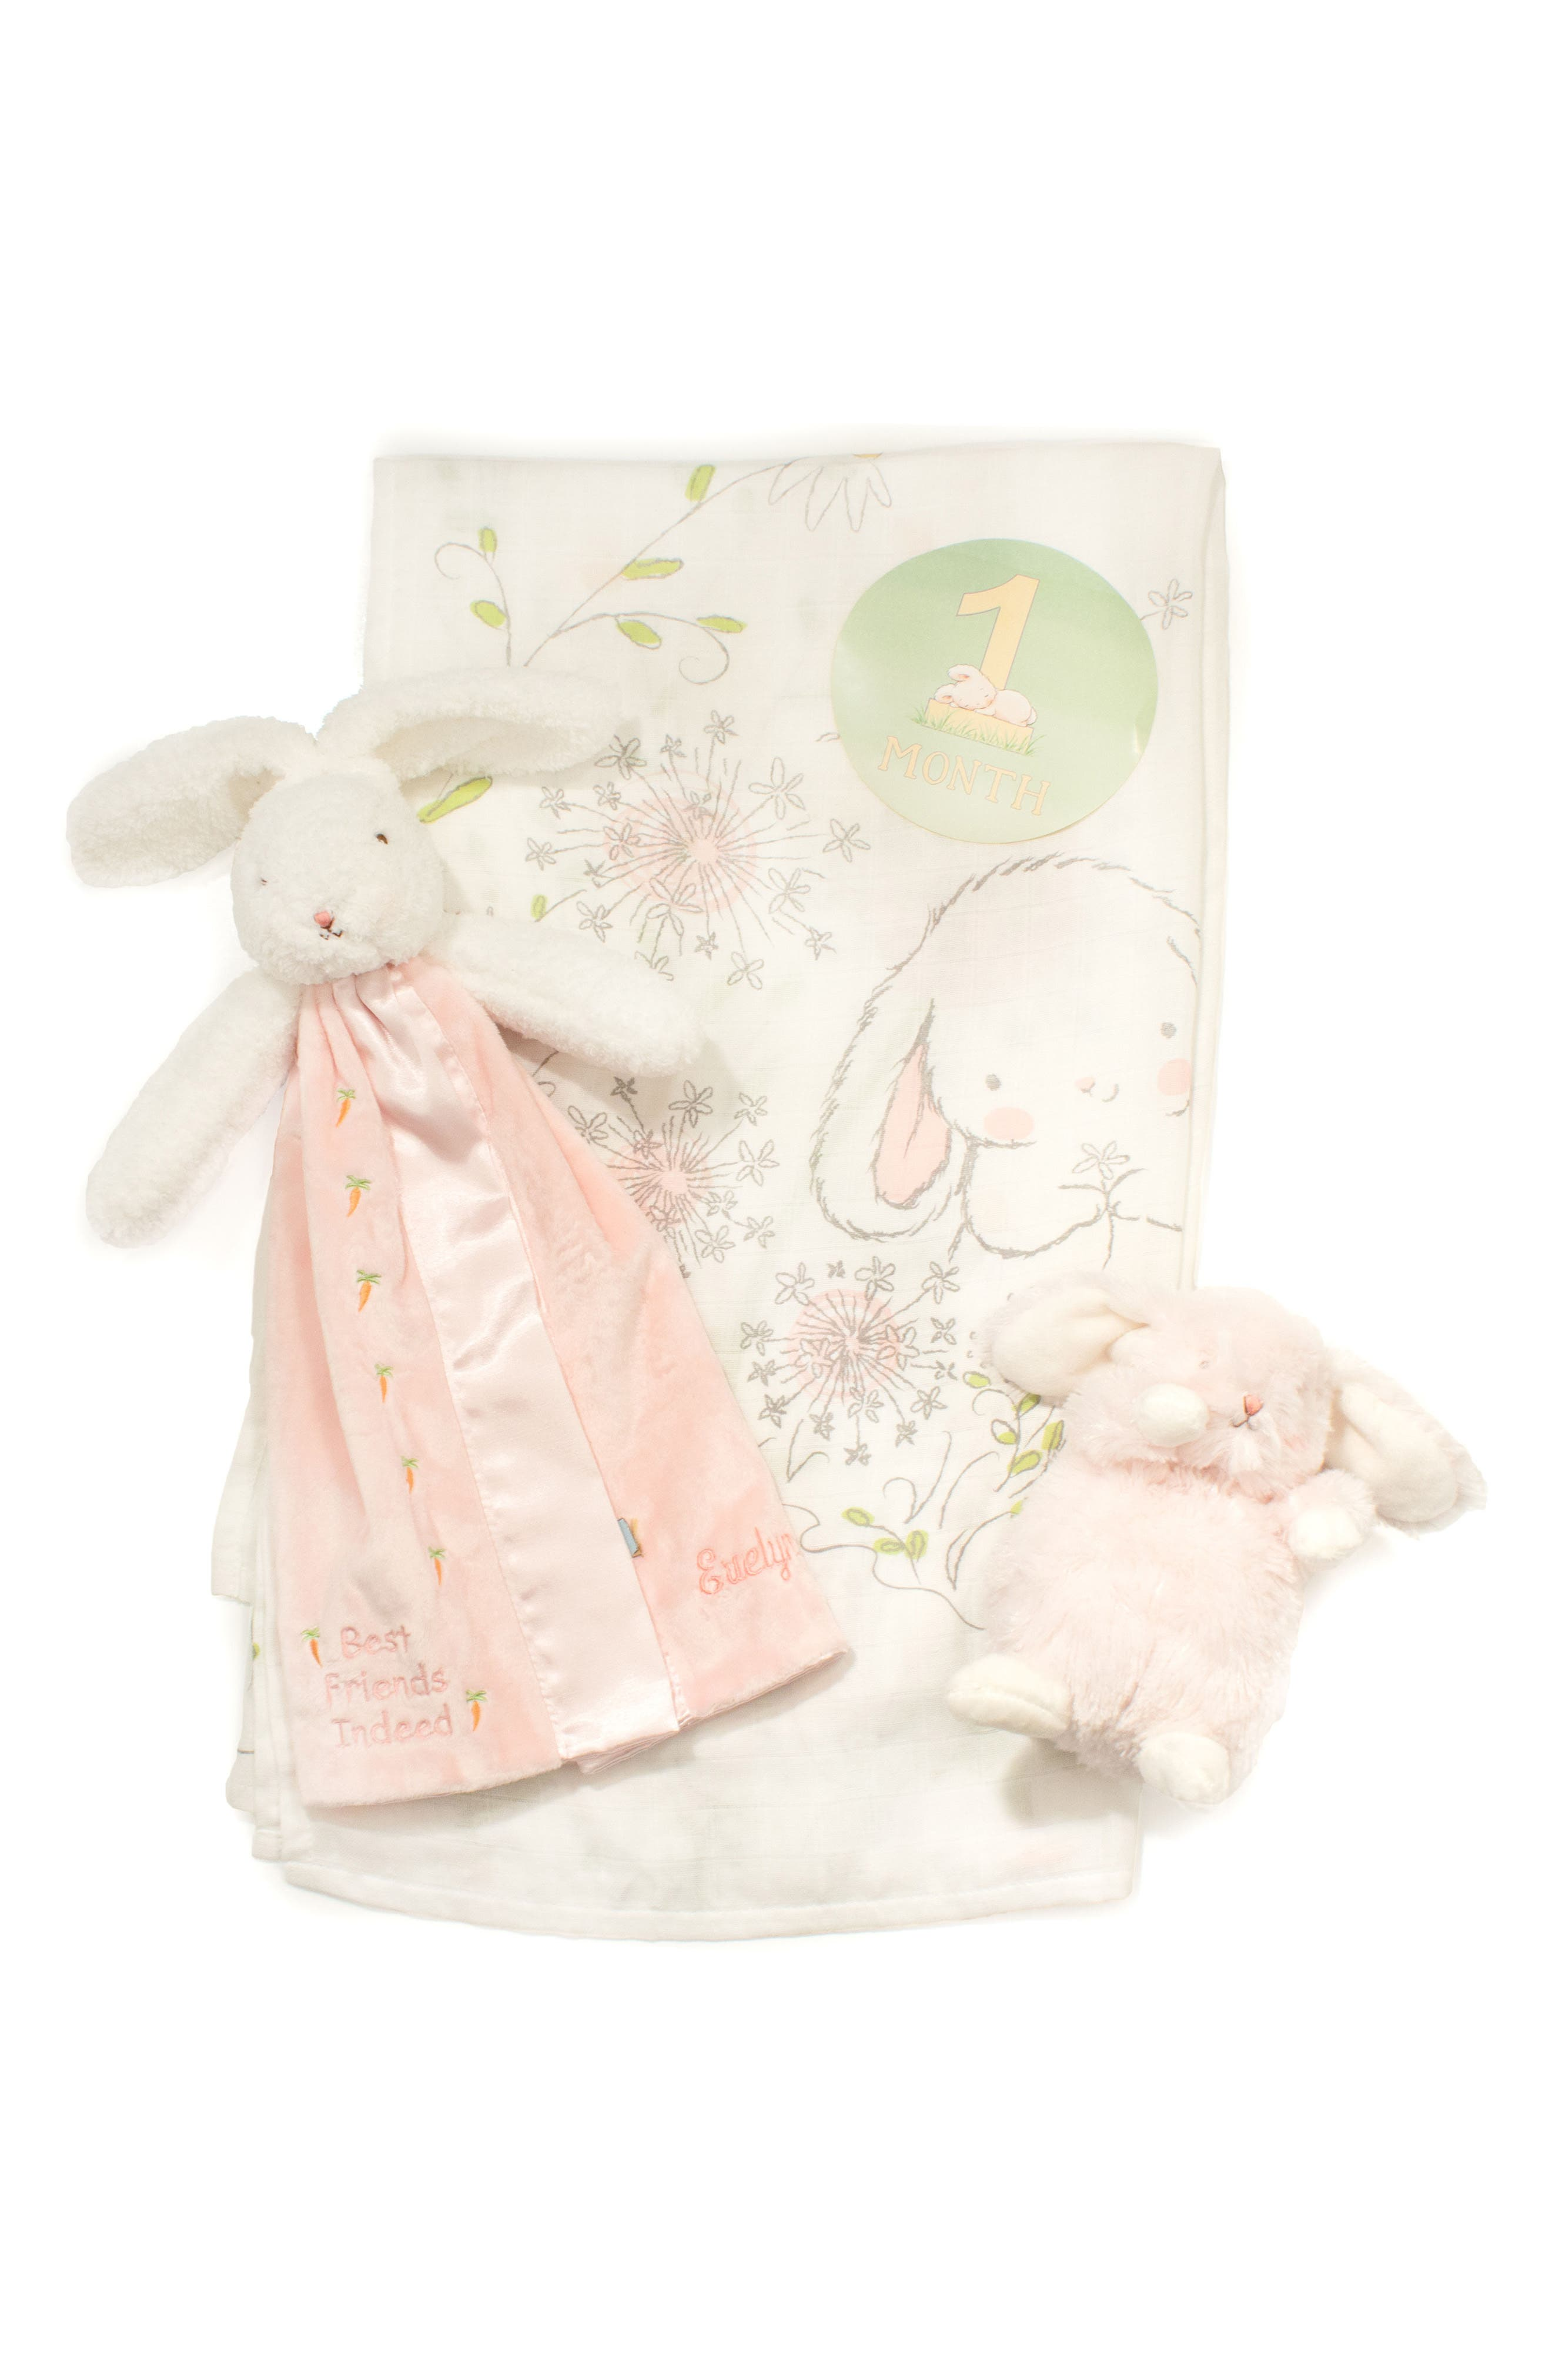 Growing Like a Weed Milestone Stickers, Swaddle Blanket, Lovie & Stuffed Animal Set,                         Main,                         color, SWEET AND TENDER WHITE